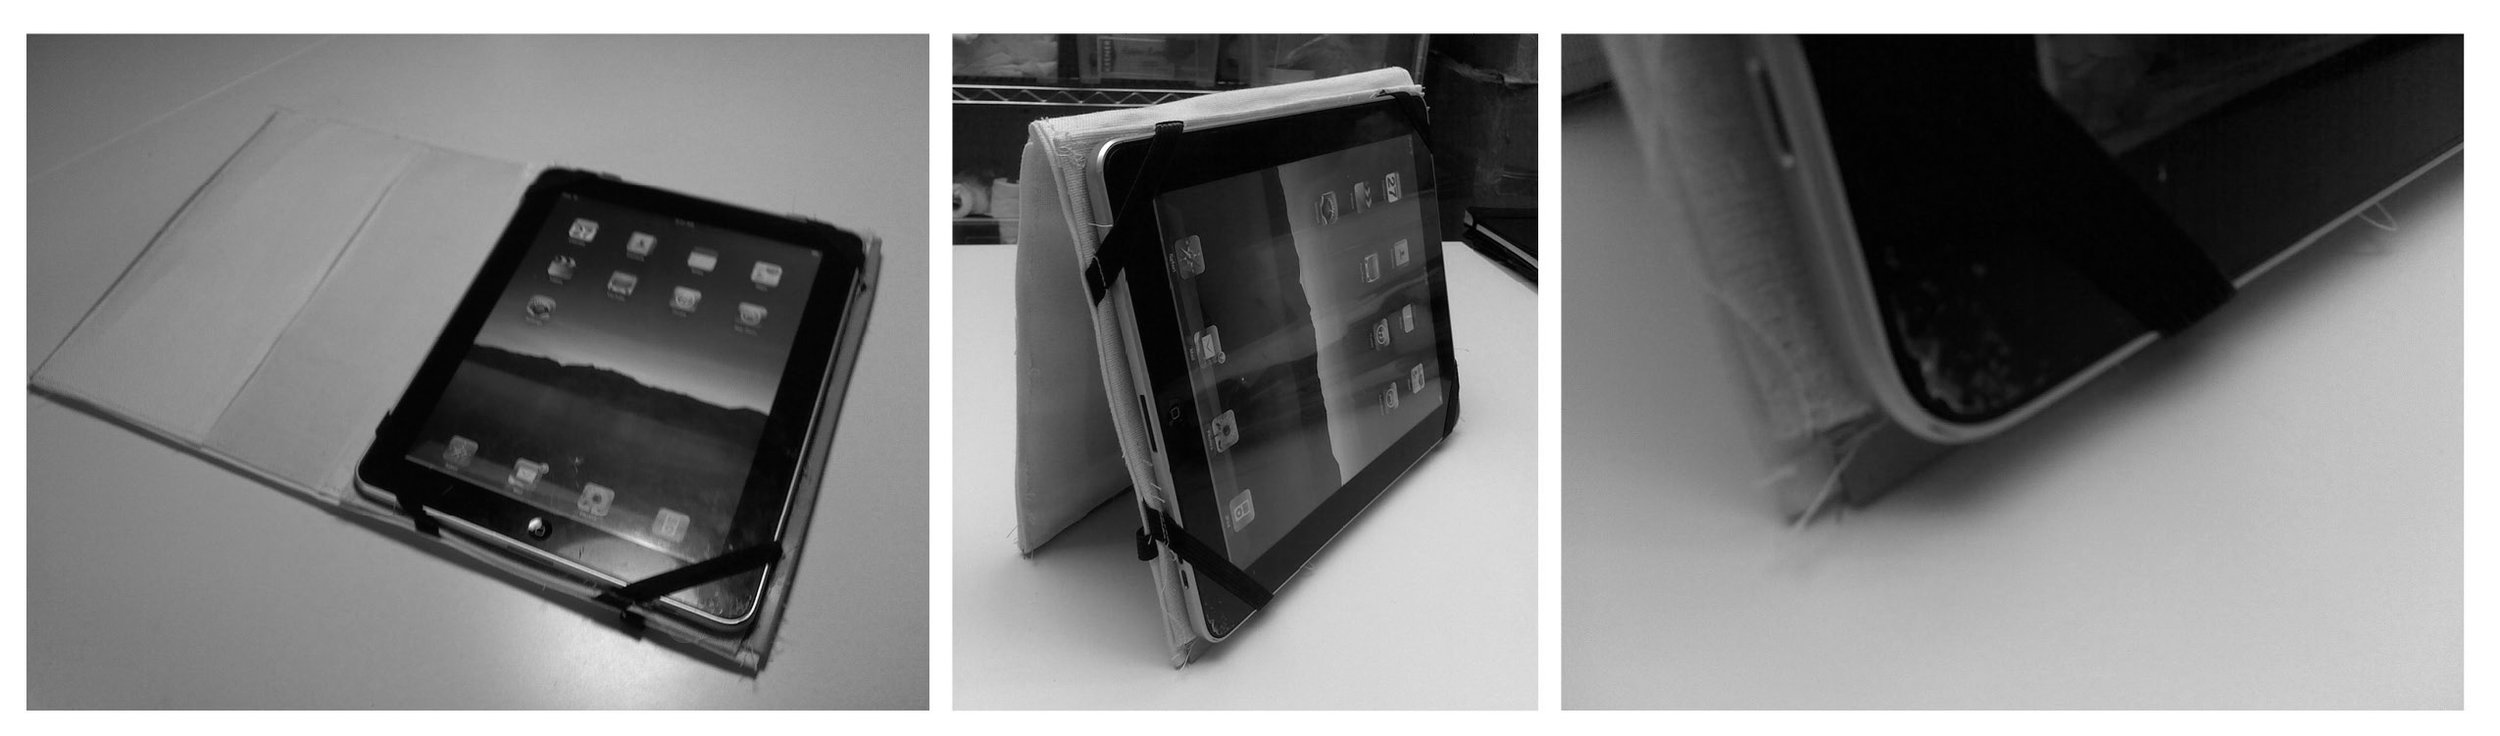 prototyping2.jpg